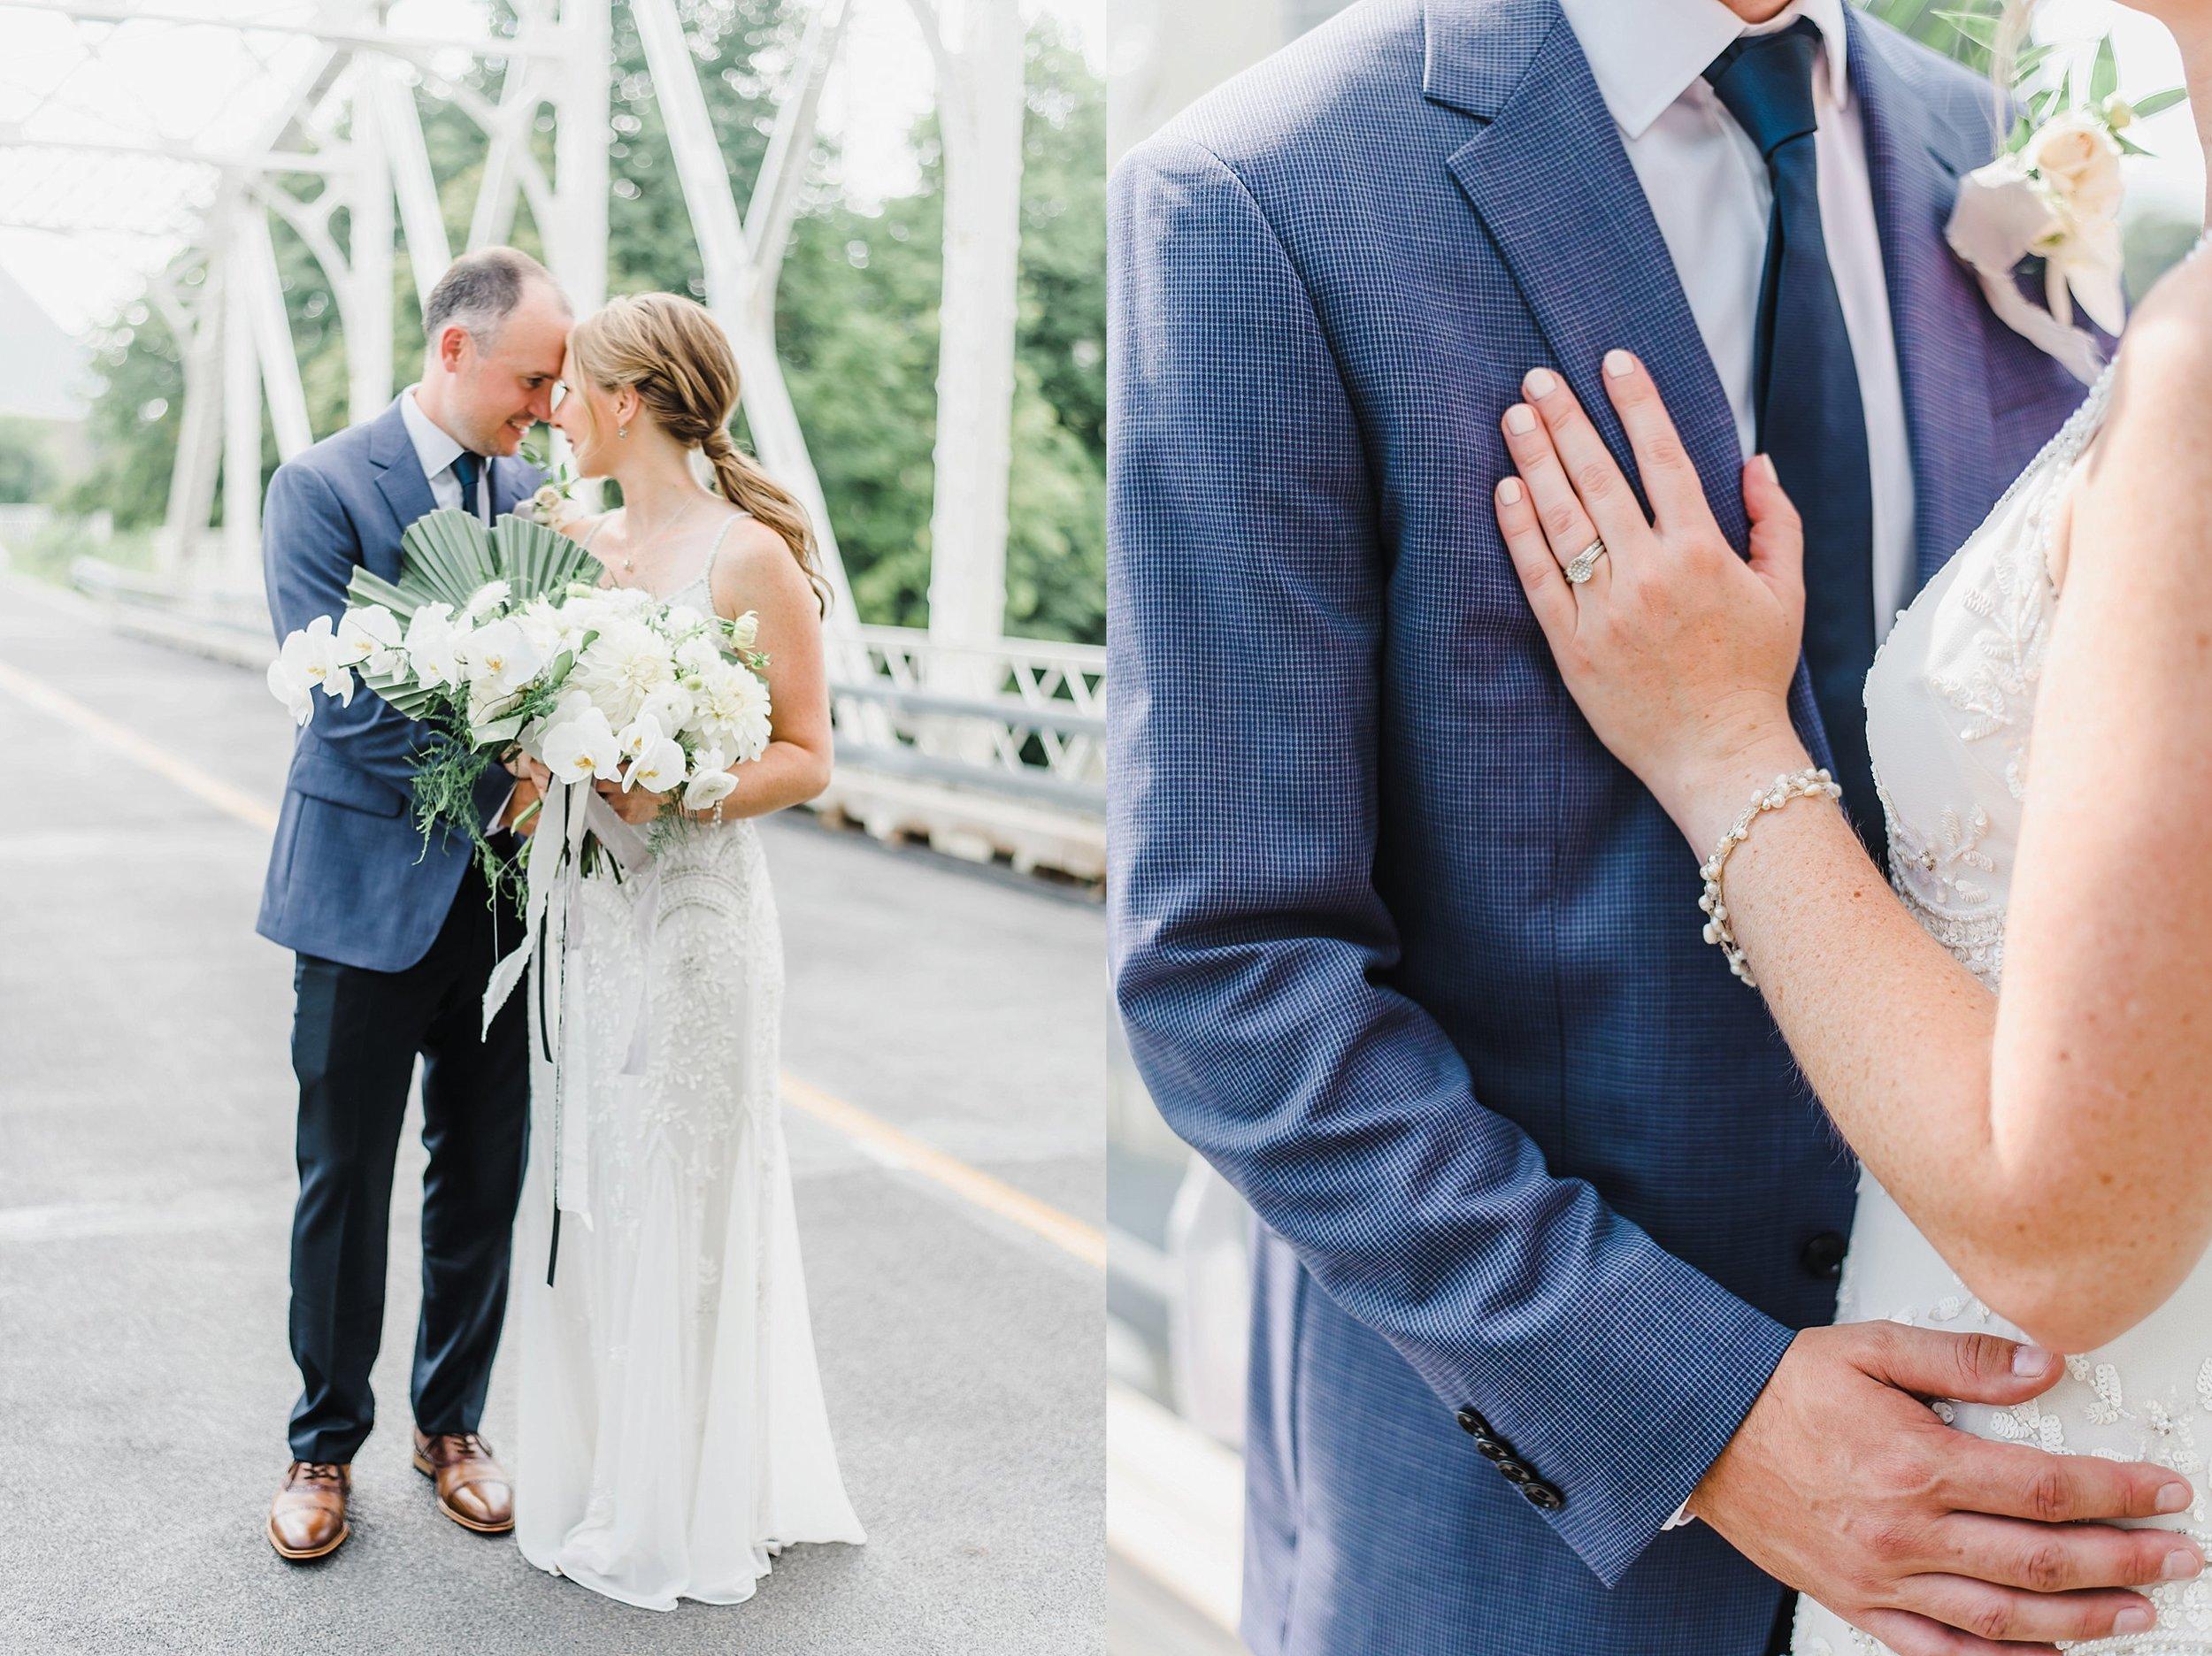 light airy indie fine art ottawa wedding photographer | Ali and Batoul Photography_0640.jpg